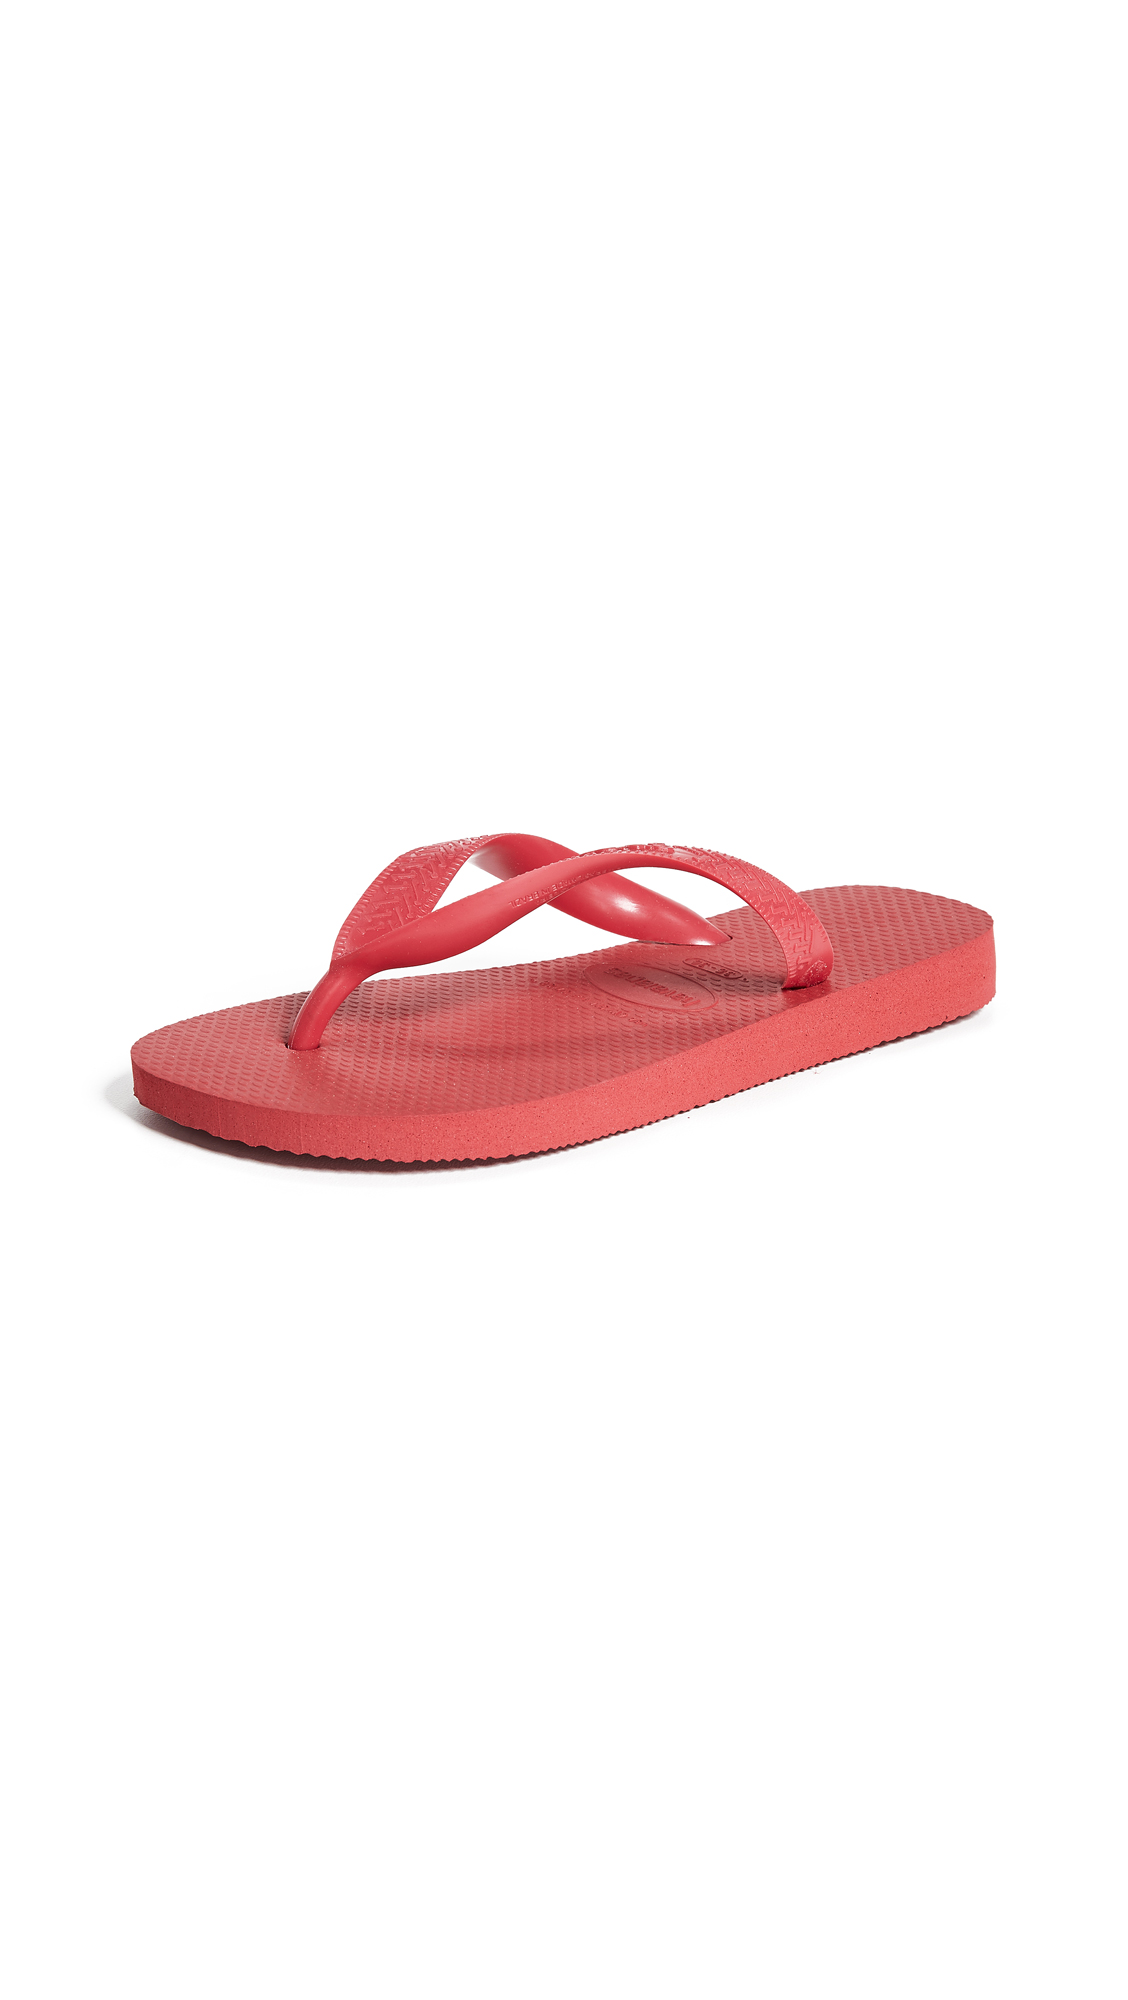 3848bfd206d34 Havaianas Slim Flip Flops